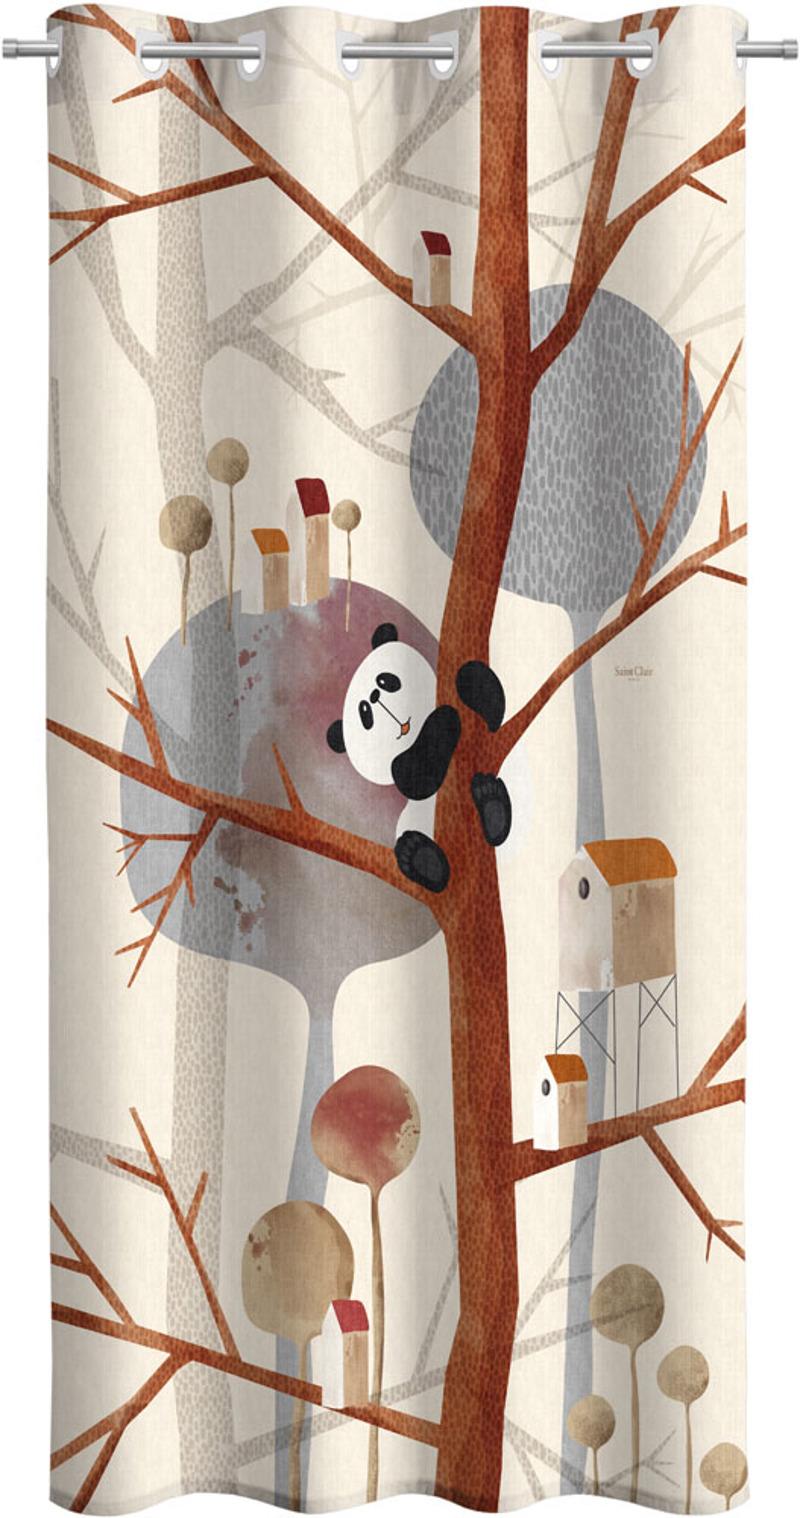 Saint Clair Κουρτίνα Soft-Touch Panda 160×240